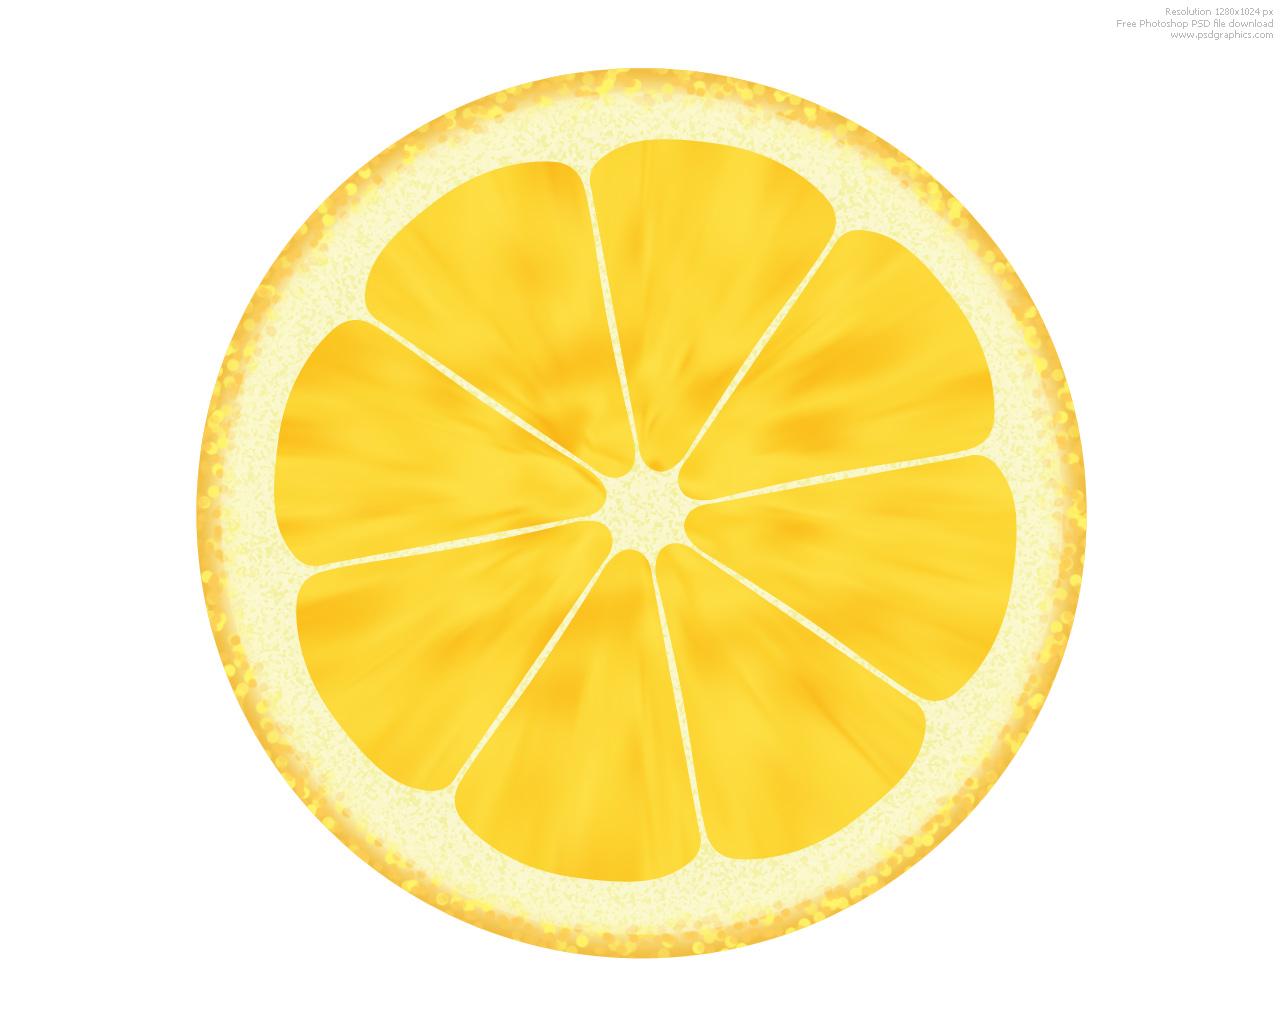 Lemon slice background - Free PNG Lemon Slice